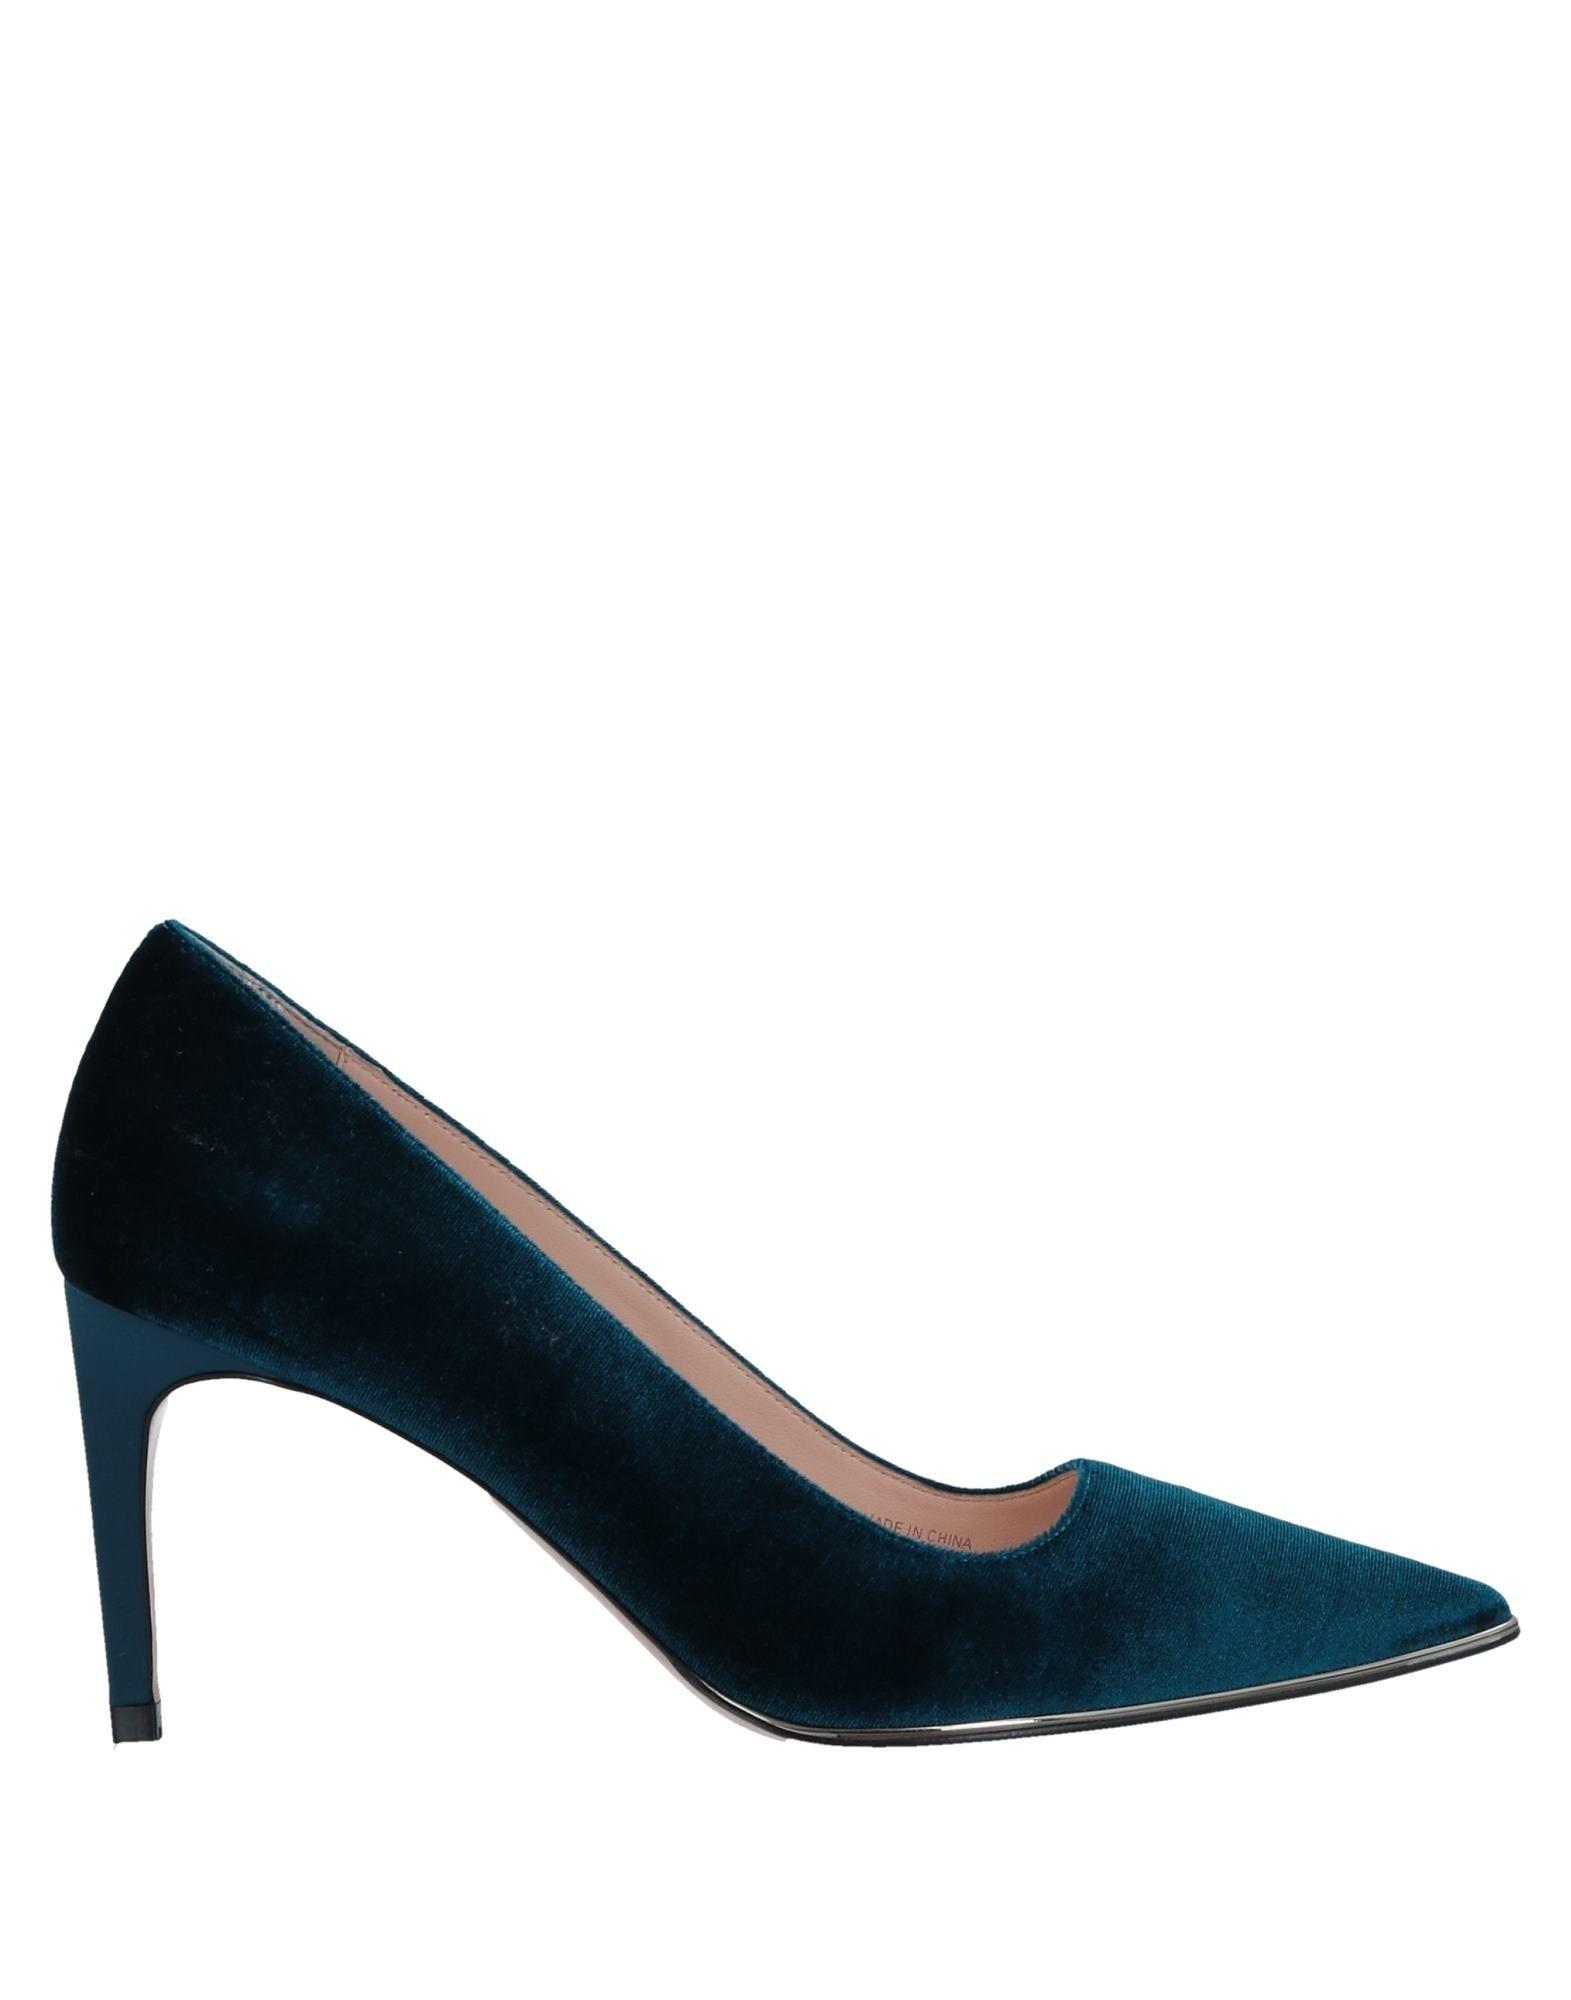 Stilvolle billige Schuhe Carlo Pazolini Pumps Damen  11519153NL